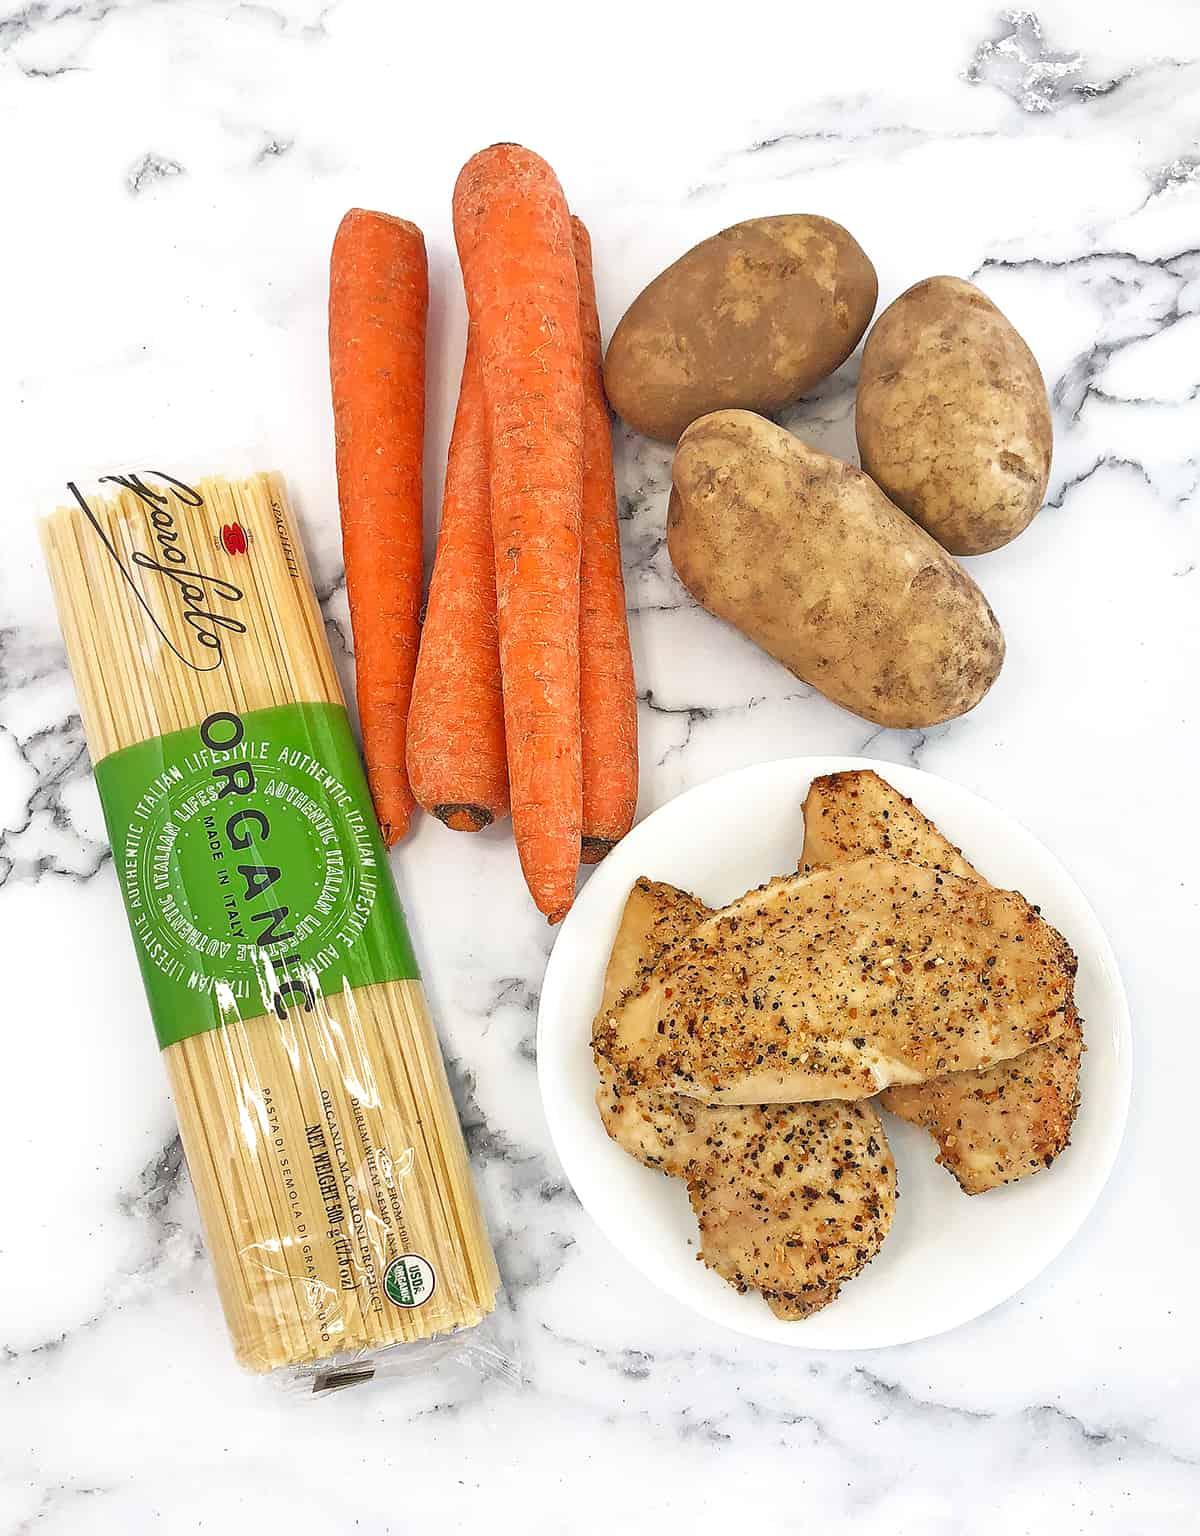 Homemade Chicken Noodle Soup Ingredients #chickennoodlesoup #homemadechickennoodlesoup #familyfavorite #comfortfoods